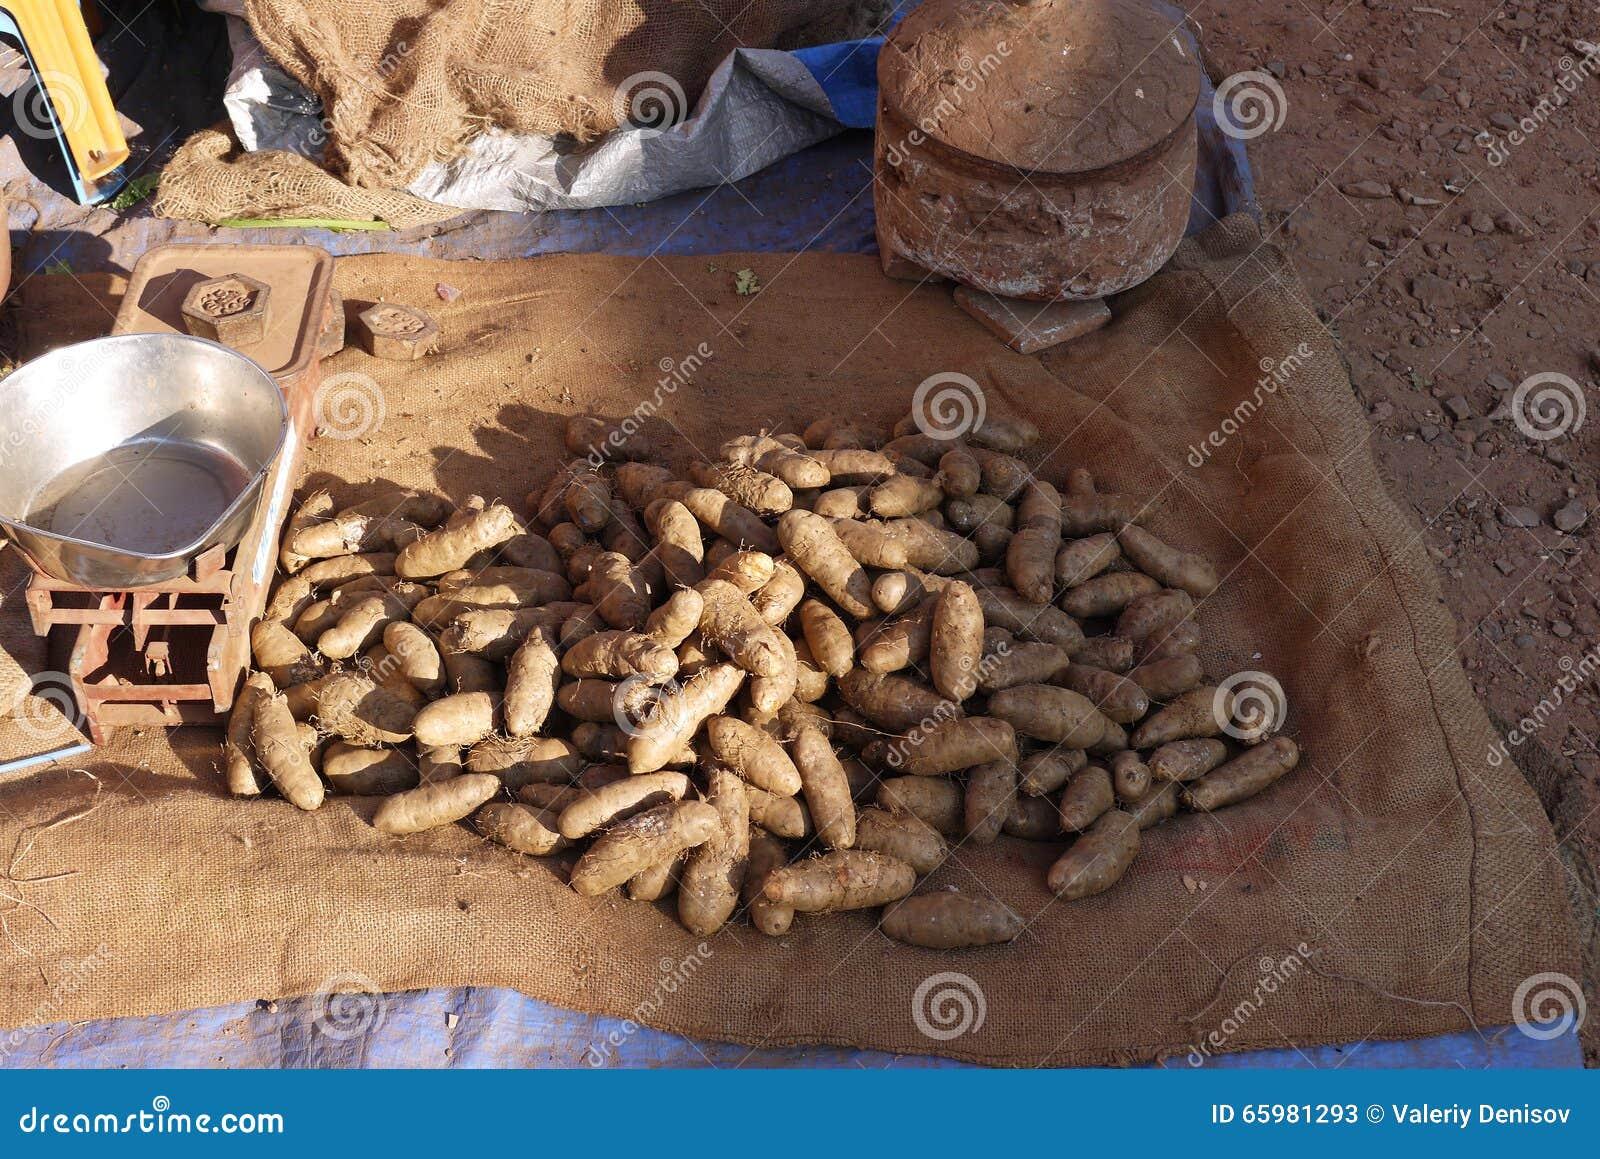 sale of exotic hairy potato stock image - image of potatoes, tubers